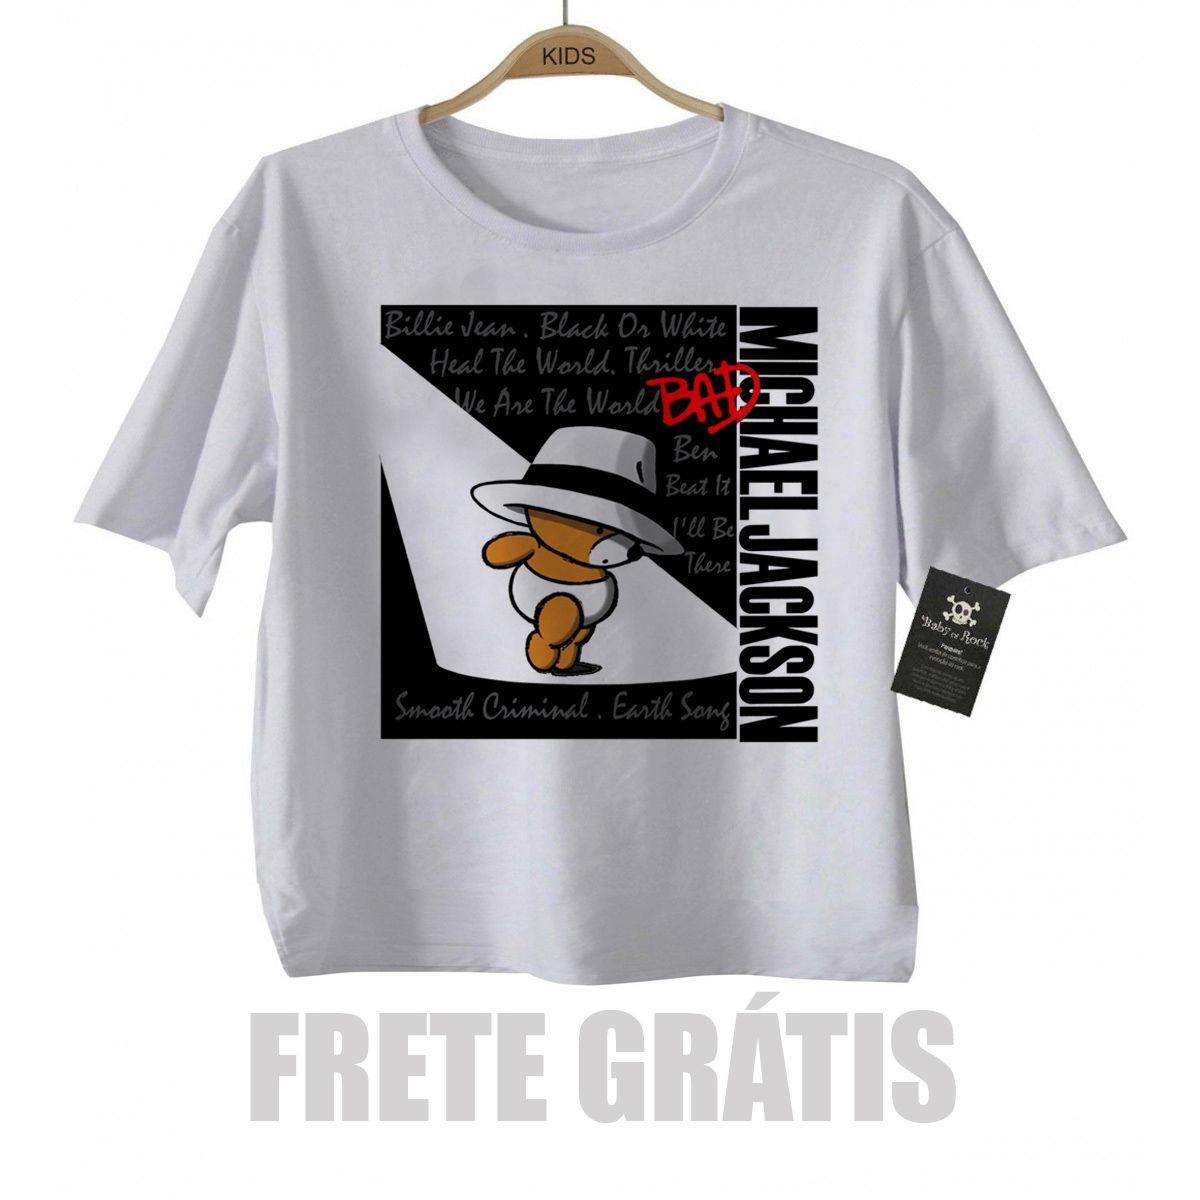 Camiseta Infantil Rock -  Michael Jackson Cute  - white  - Baby Monster S/A